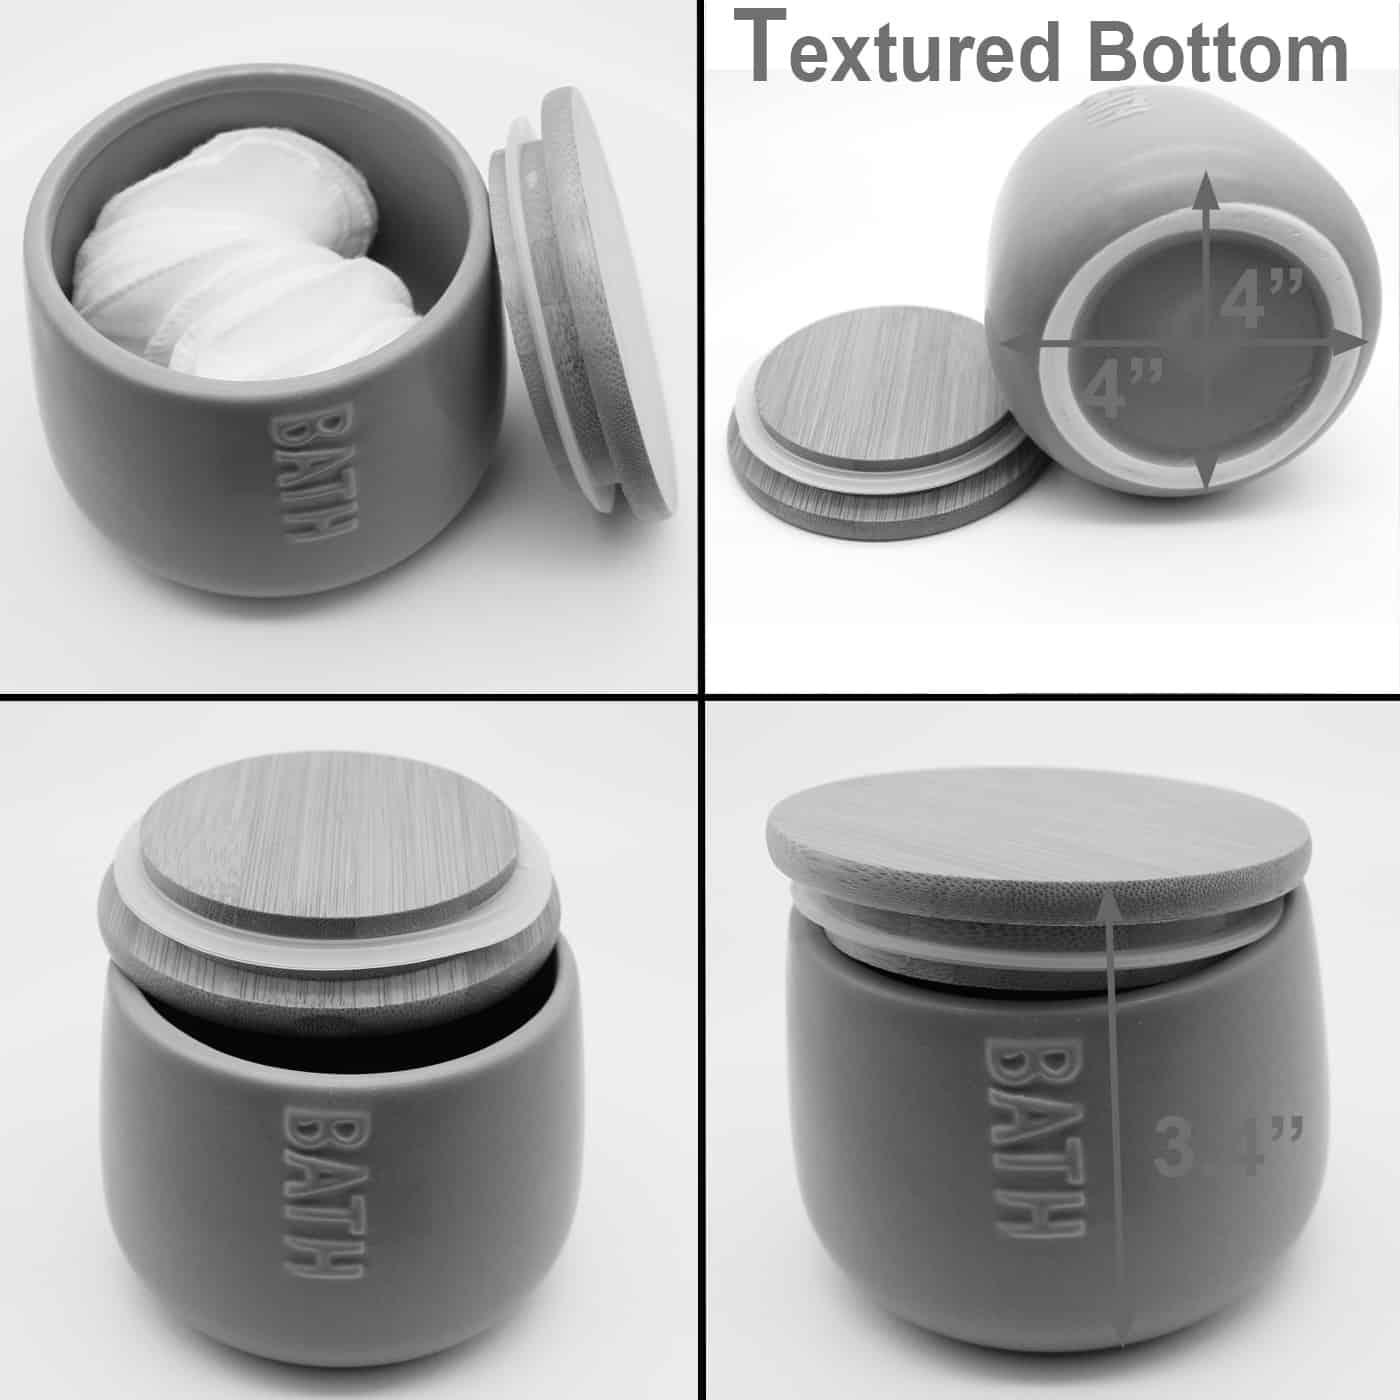 Bath D Dolomite Round Cotton Box Black-Bamboo Top